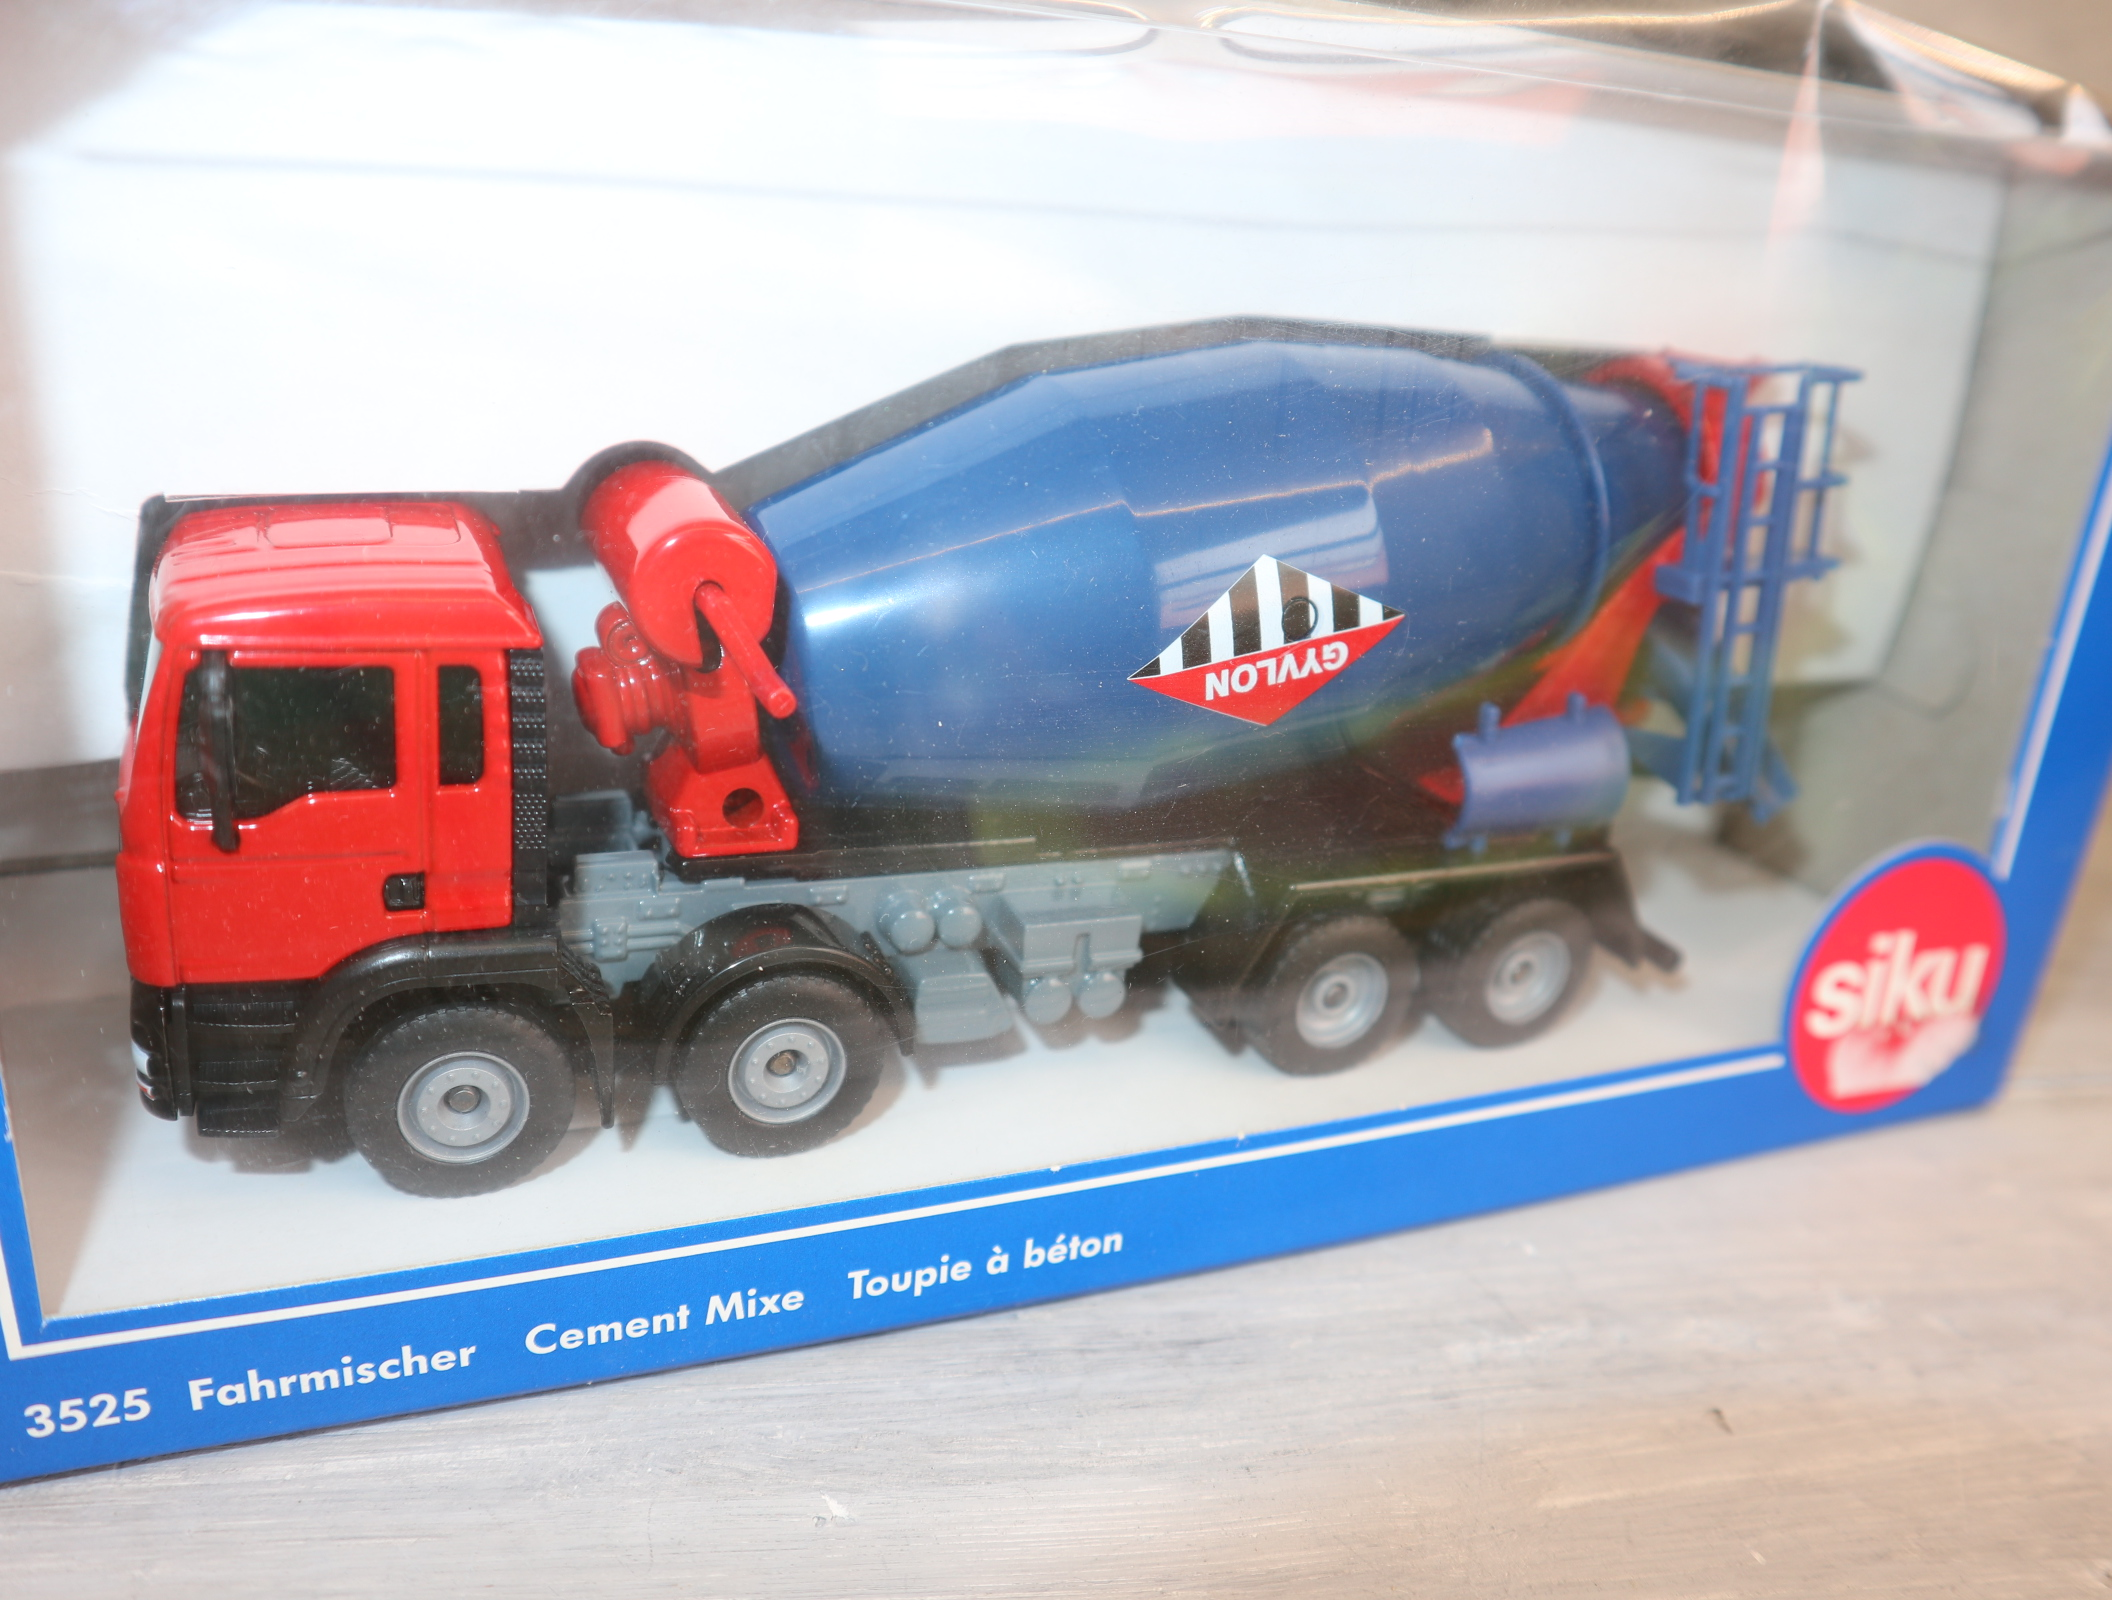 Siku 3525 1:55 Beton-Fahrmischer blau-rot komplett in OVP